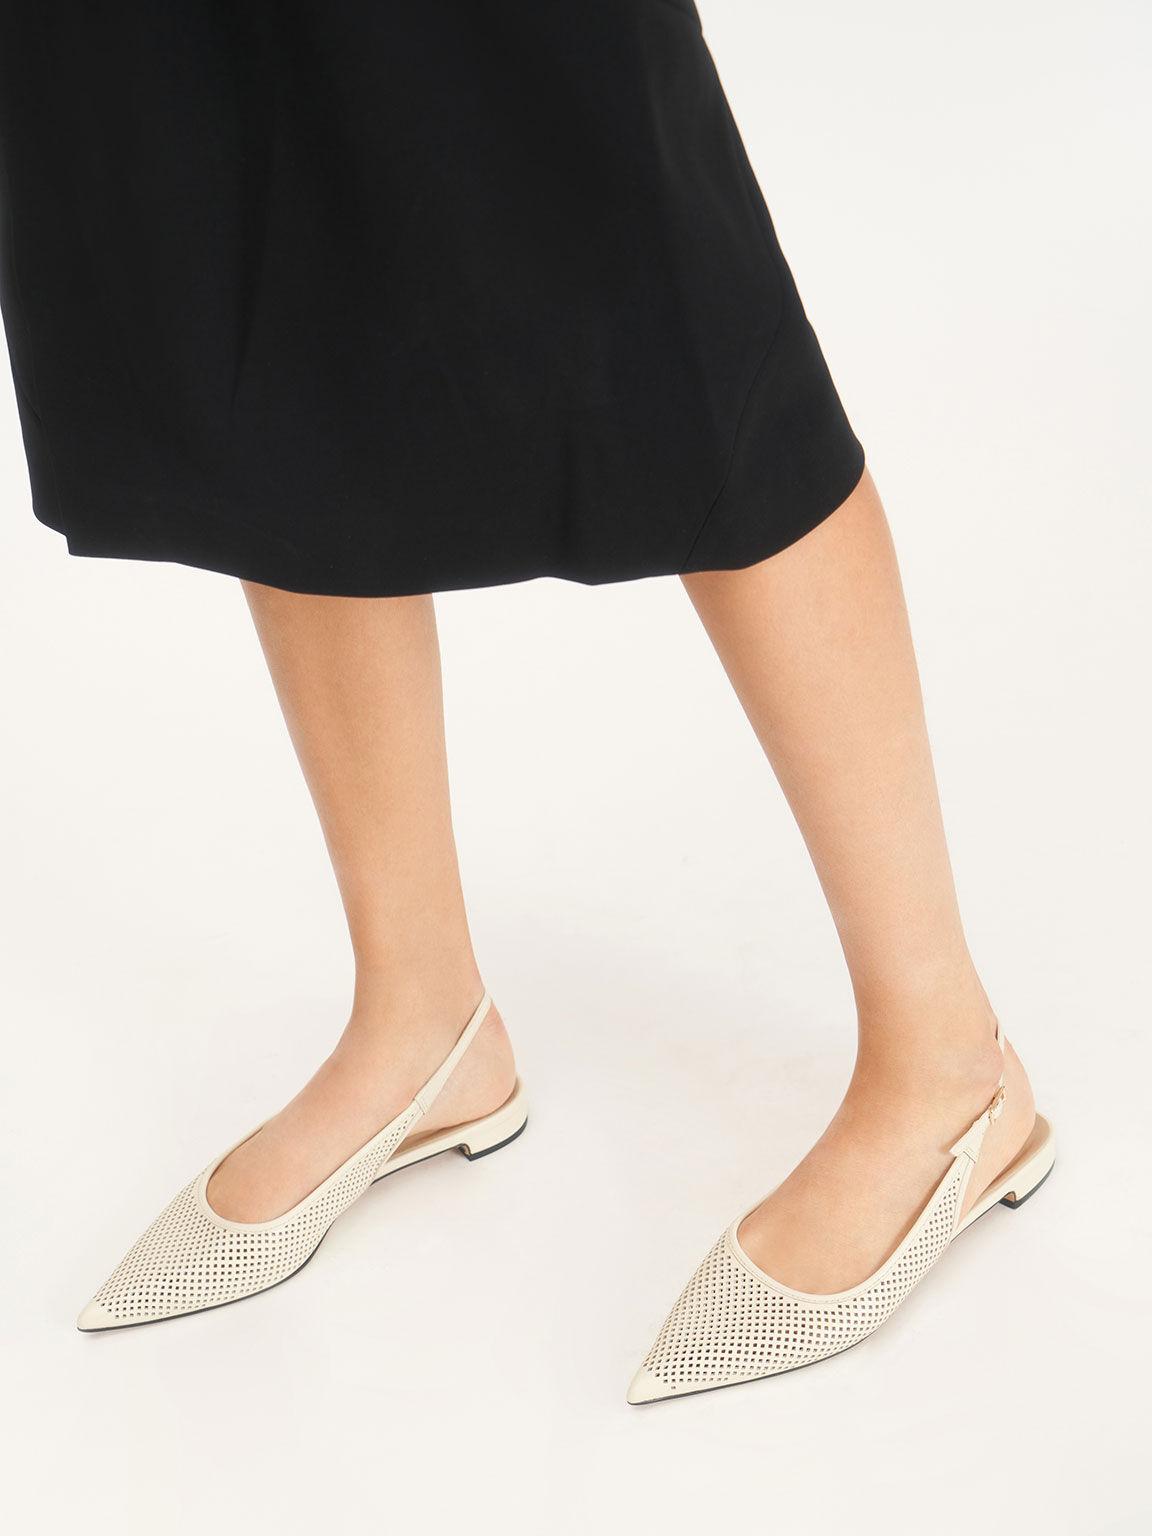 Leather Laser-Cut Slingback Ballerinas, Cream, hi-res